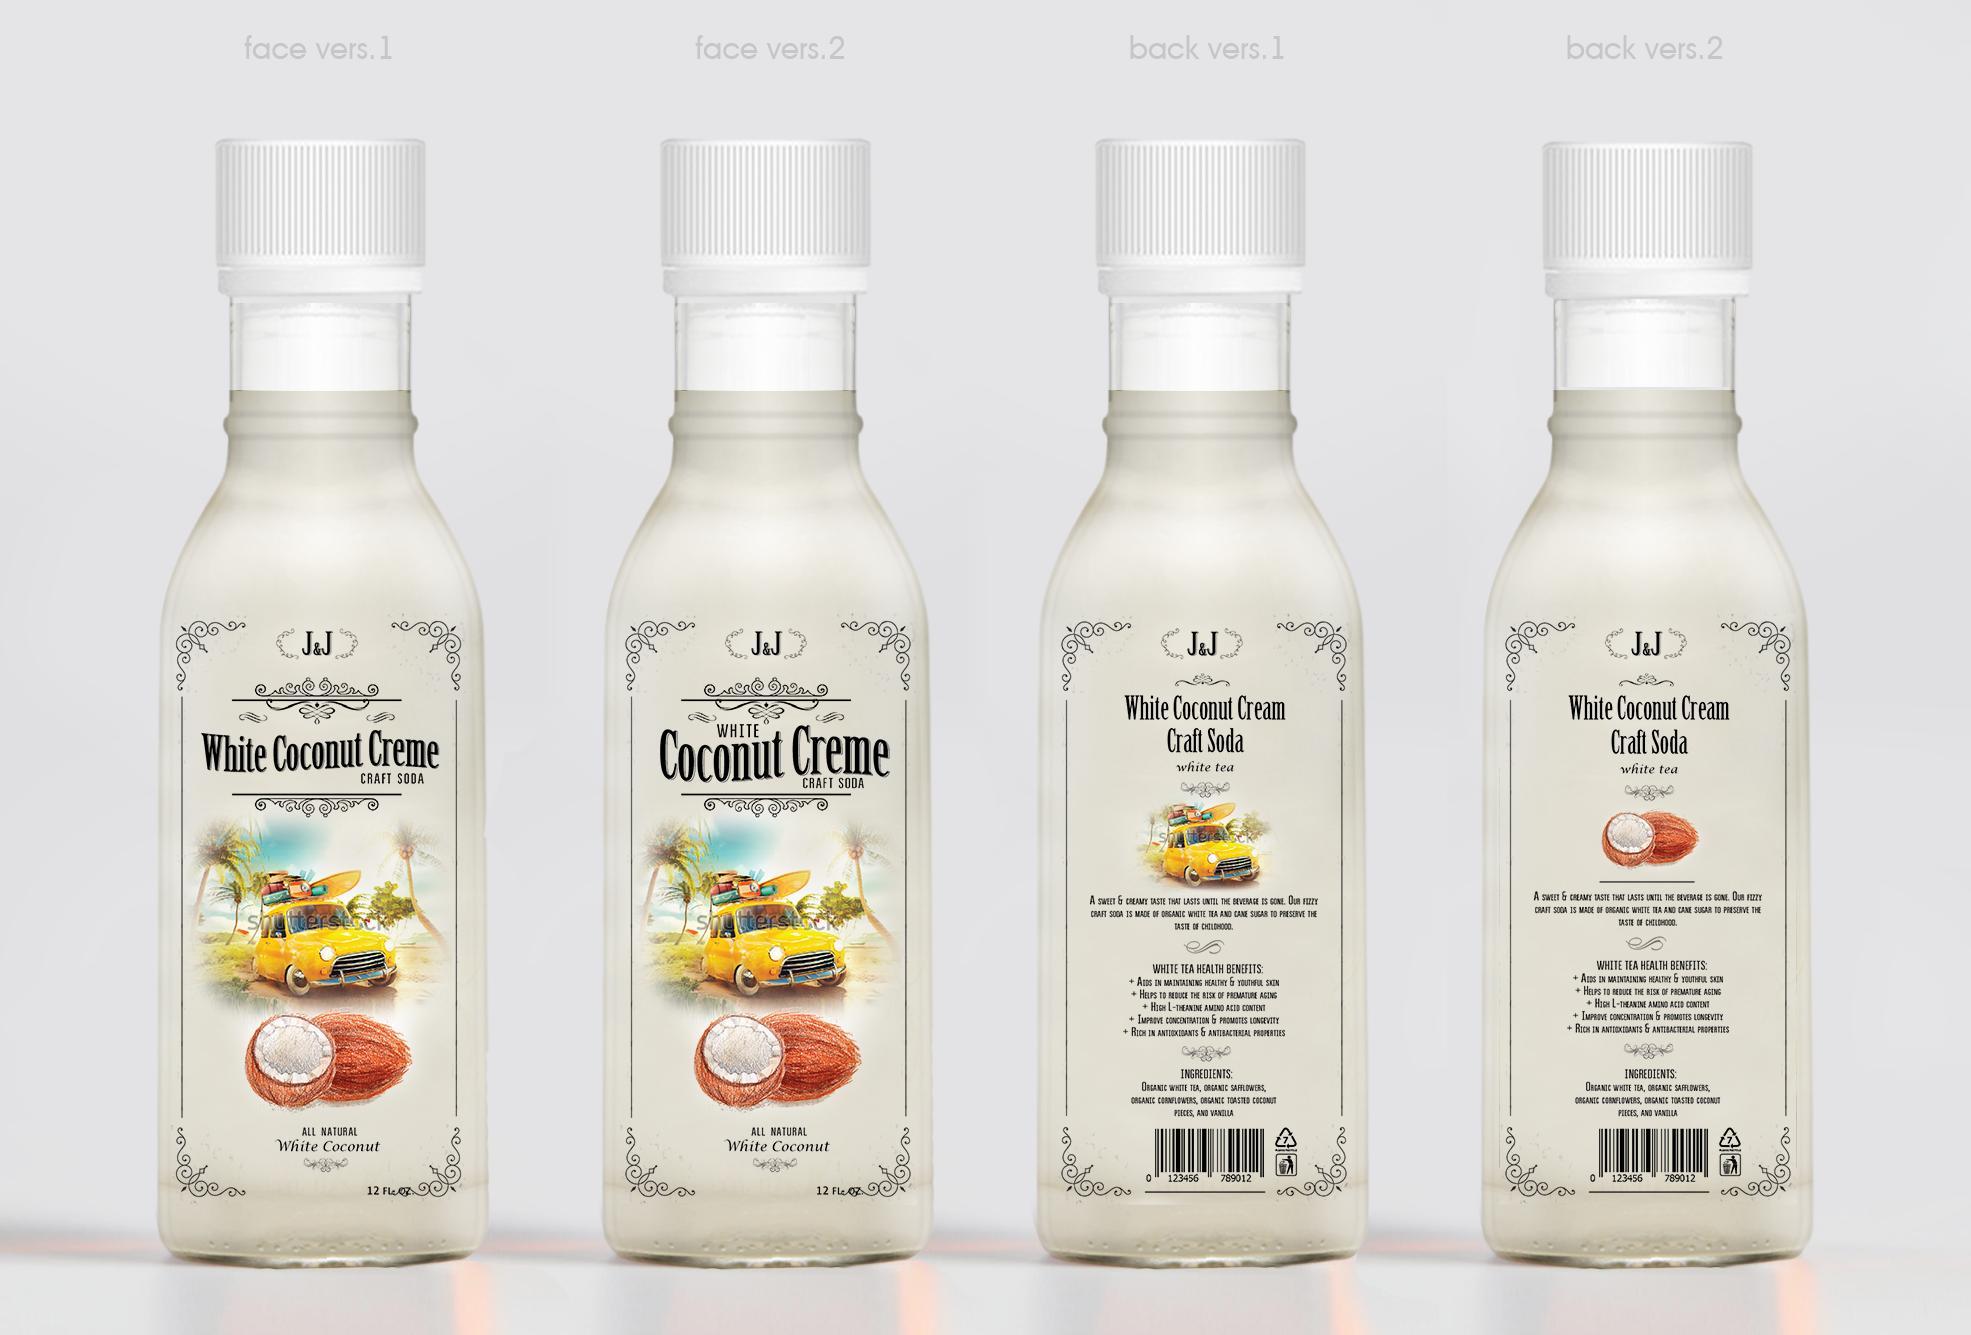 Bottle label design by lamadesign for J&J Craft Soda